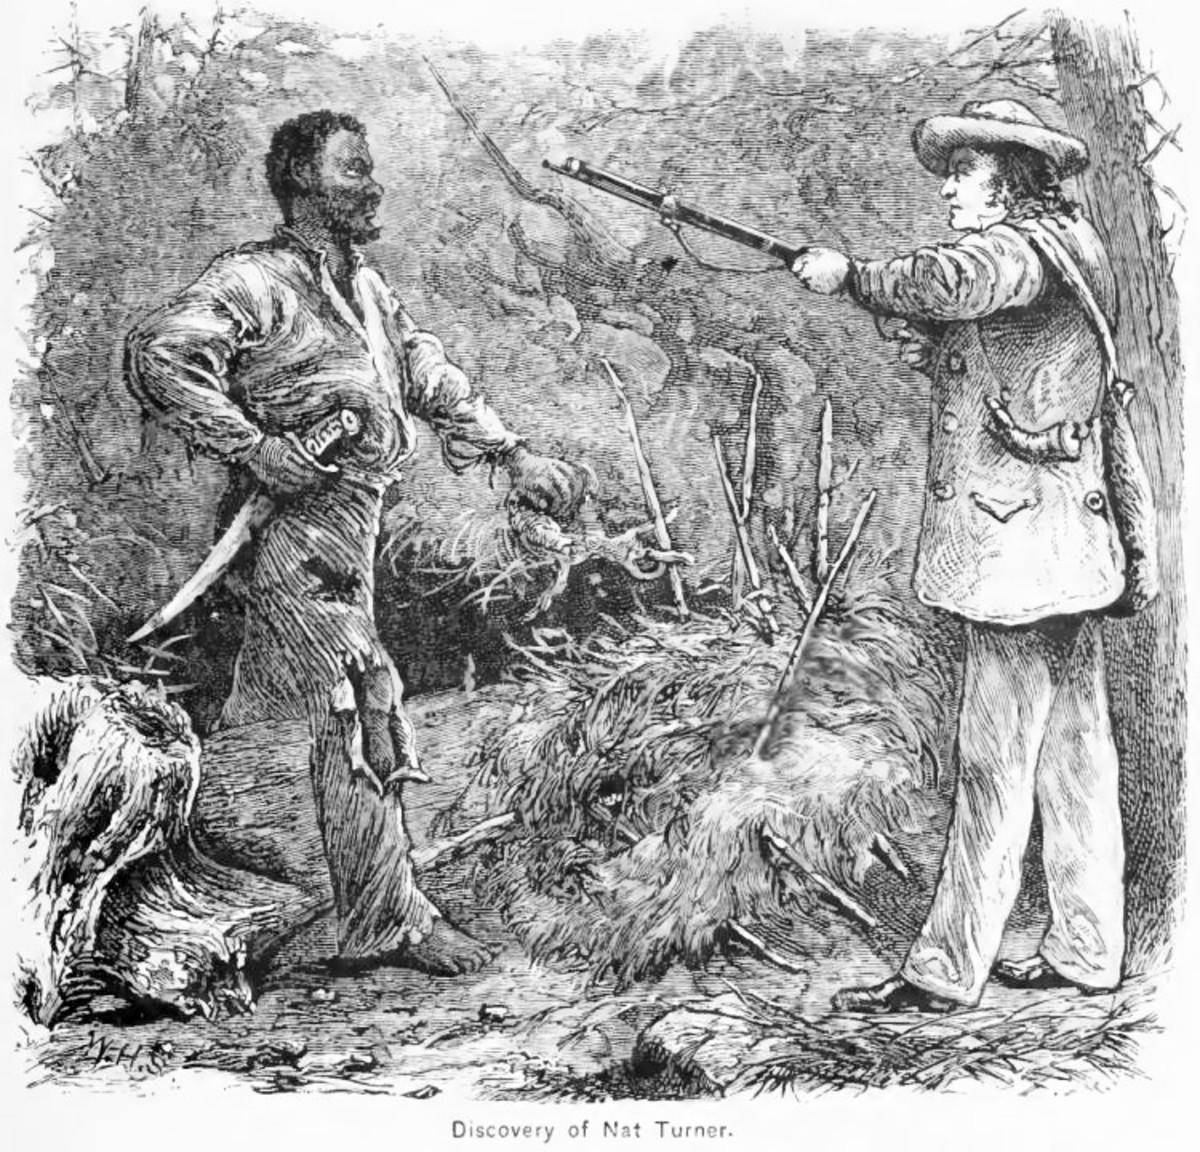 Turner captured by local militia.